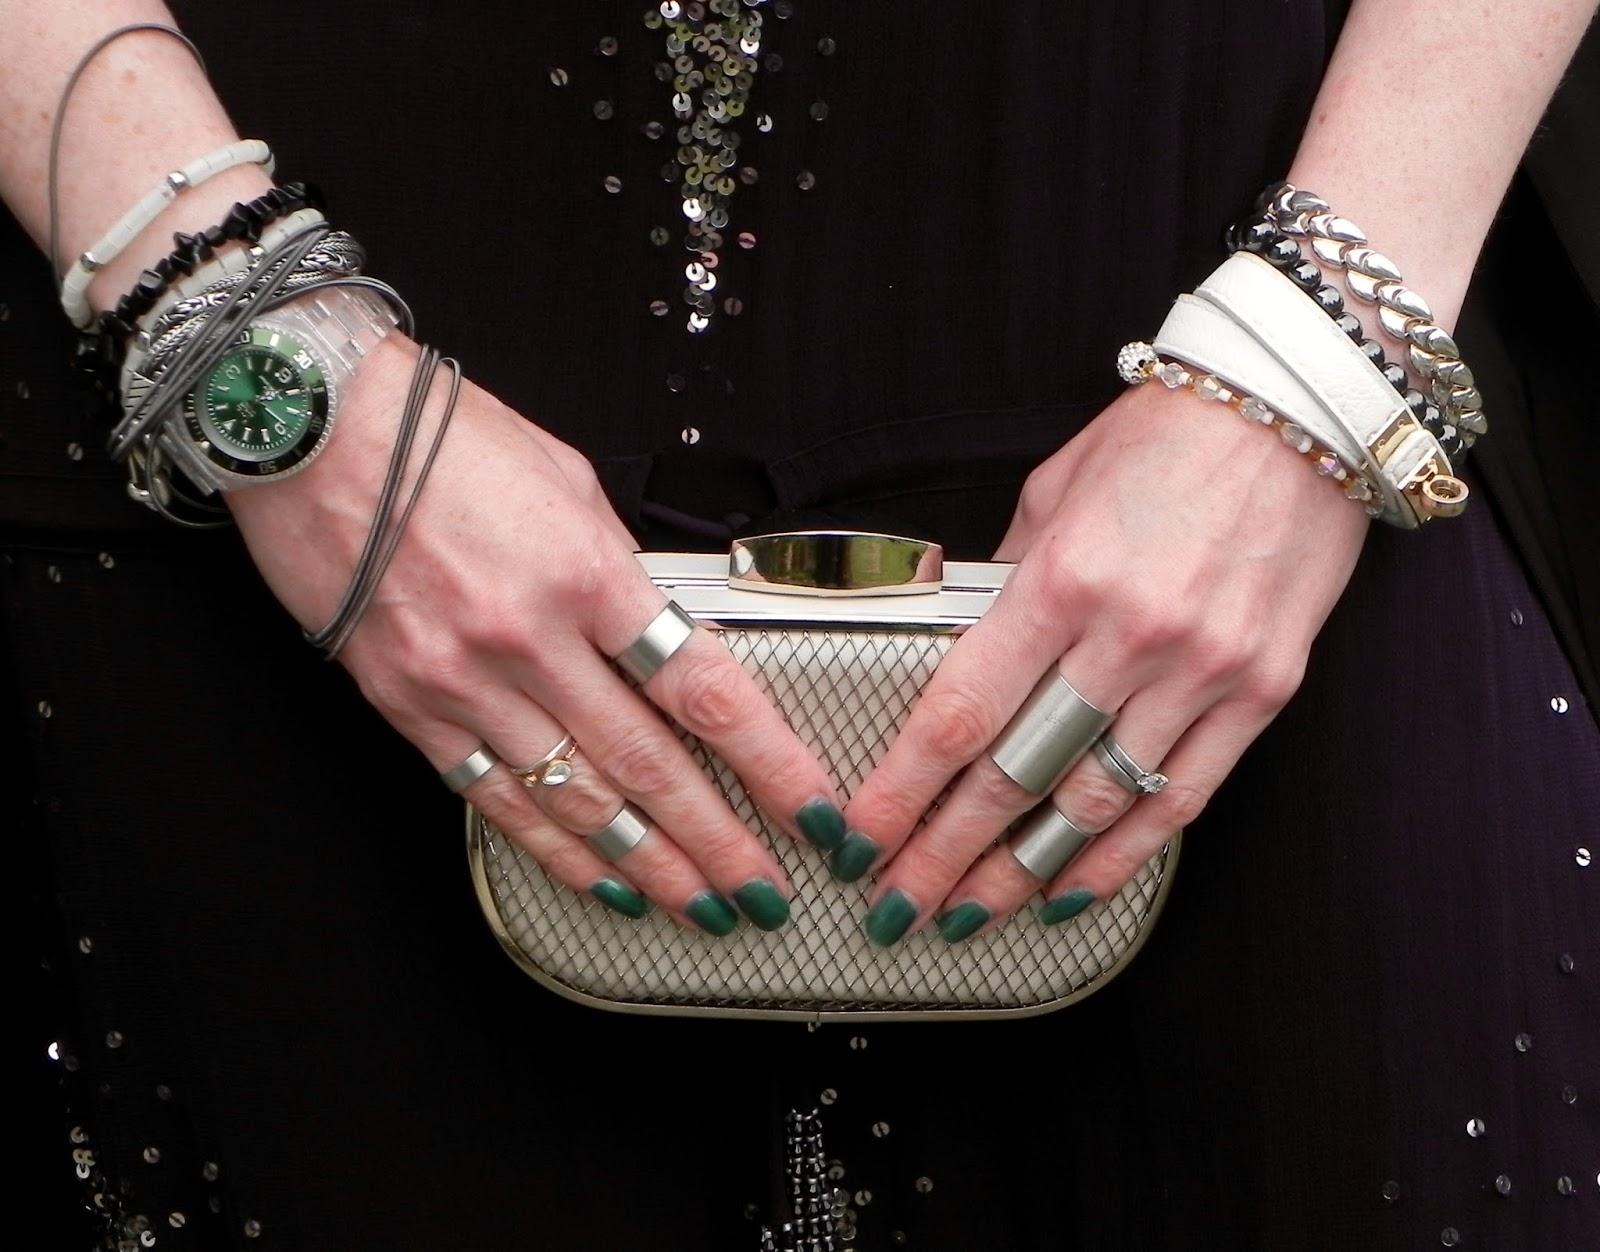 Clutch bag a multi rings, midi rings.